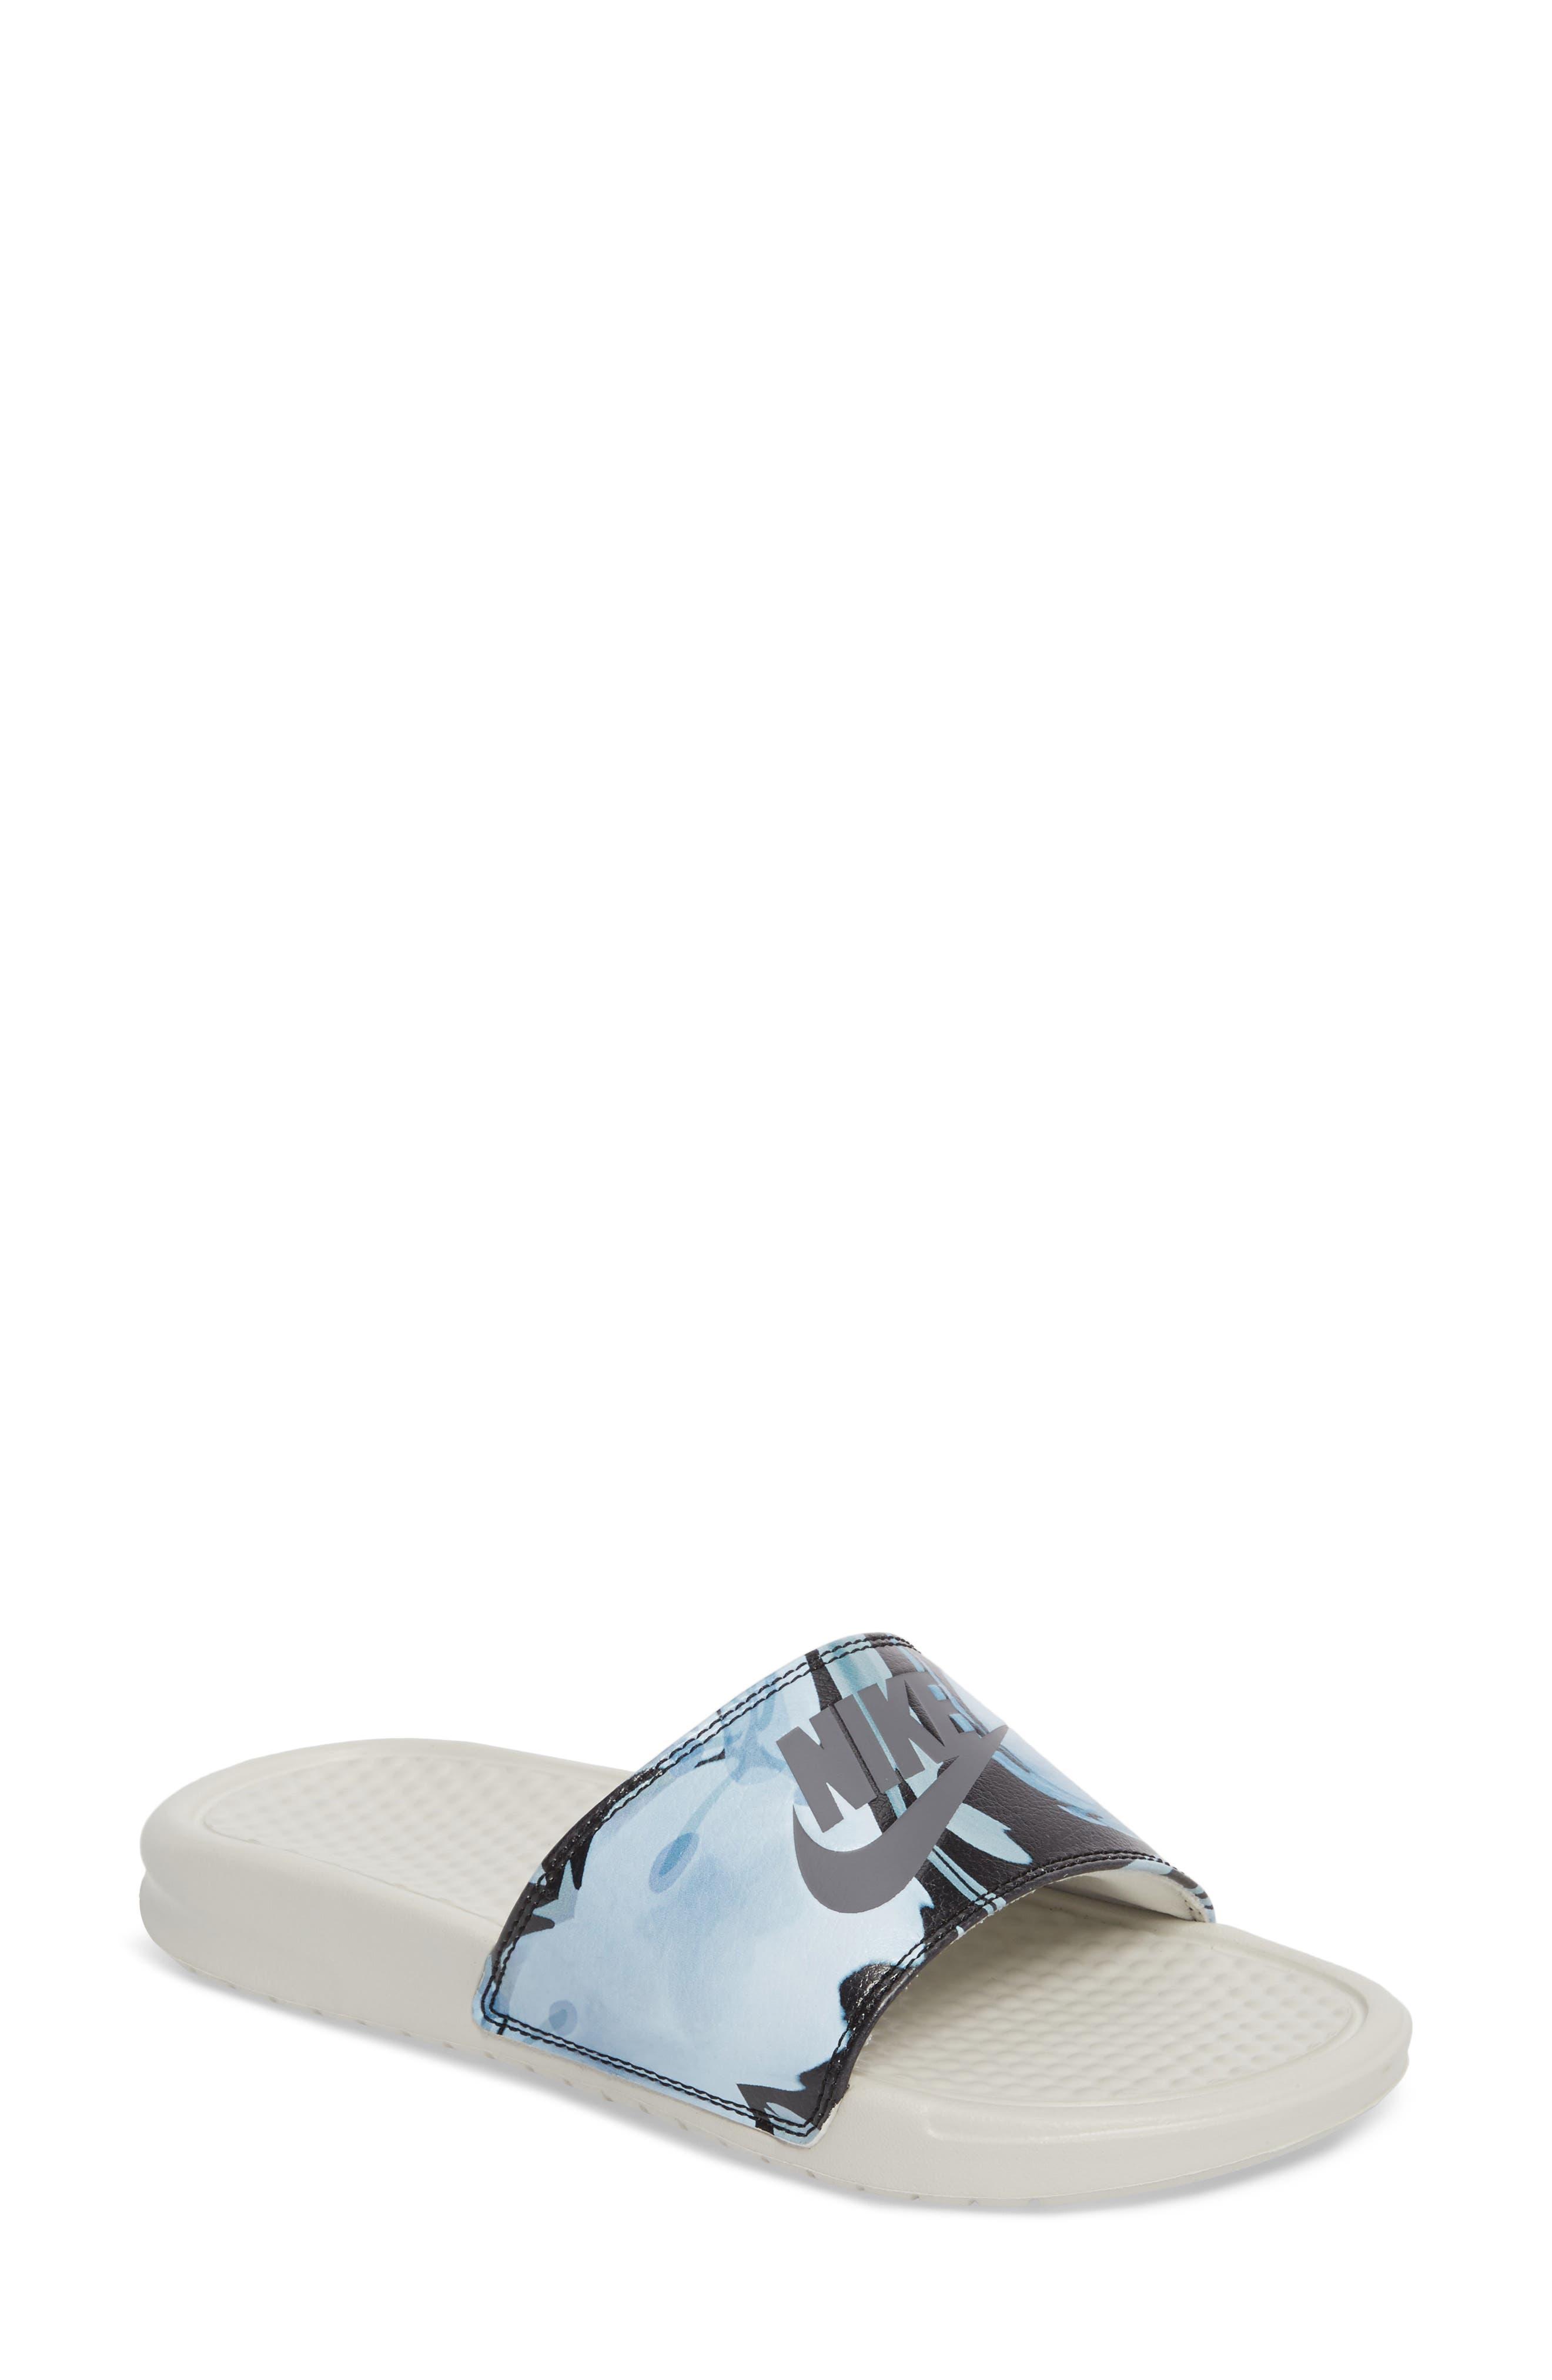 Main Image - Nike 'Benassi - Just Do It' Print Sandal (Women)